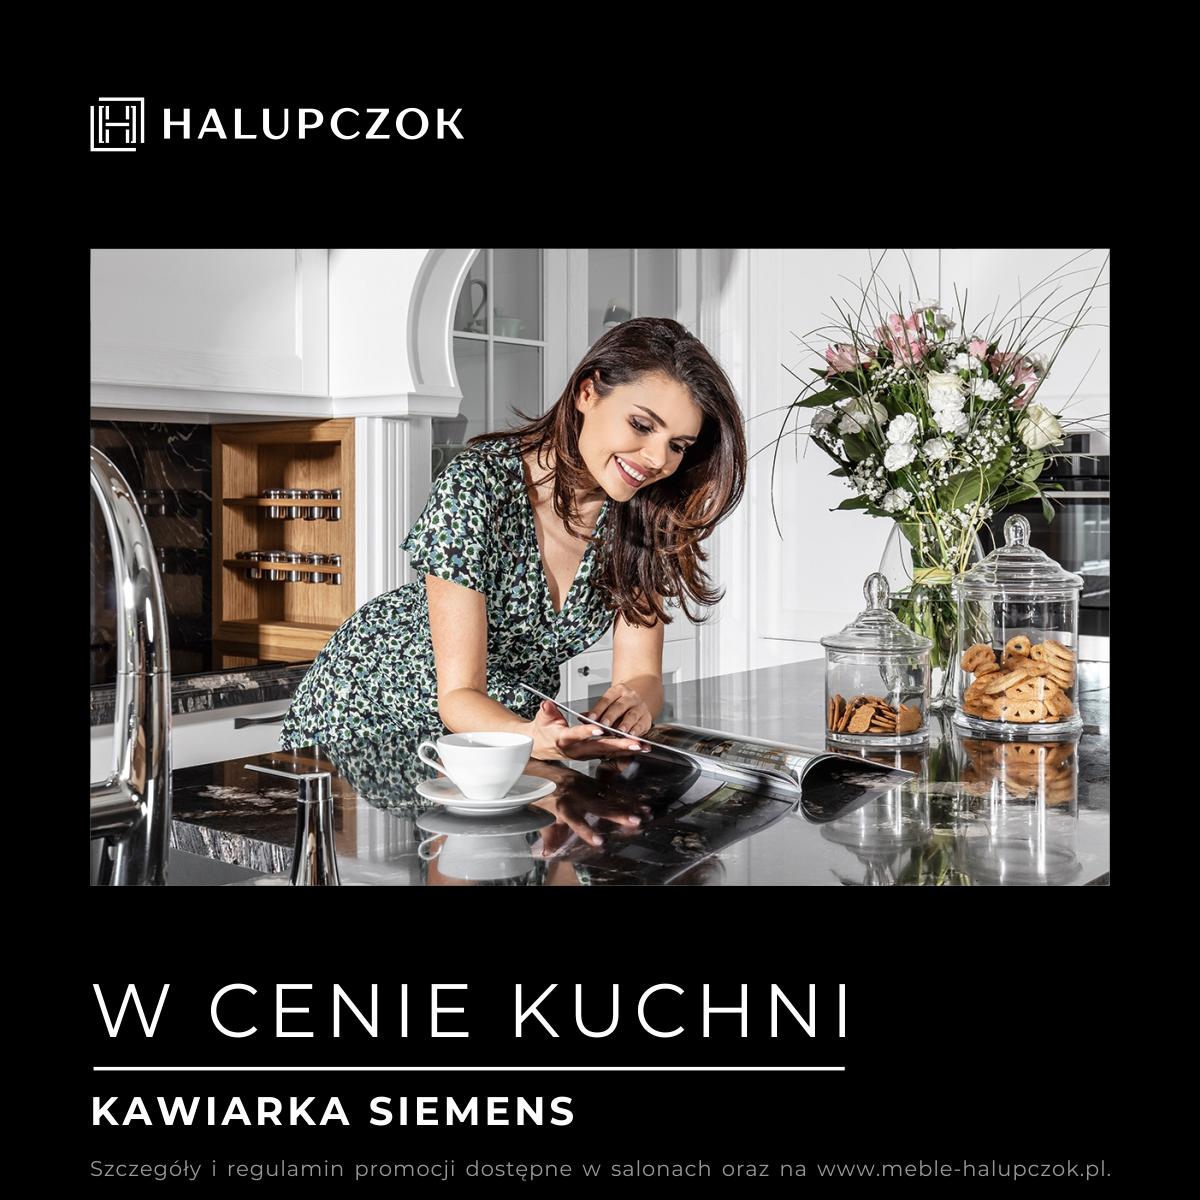 Luksusowa kawiarka w cenie kuchni